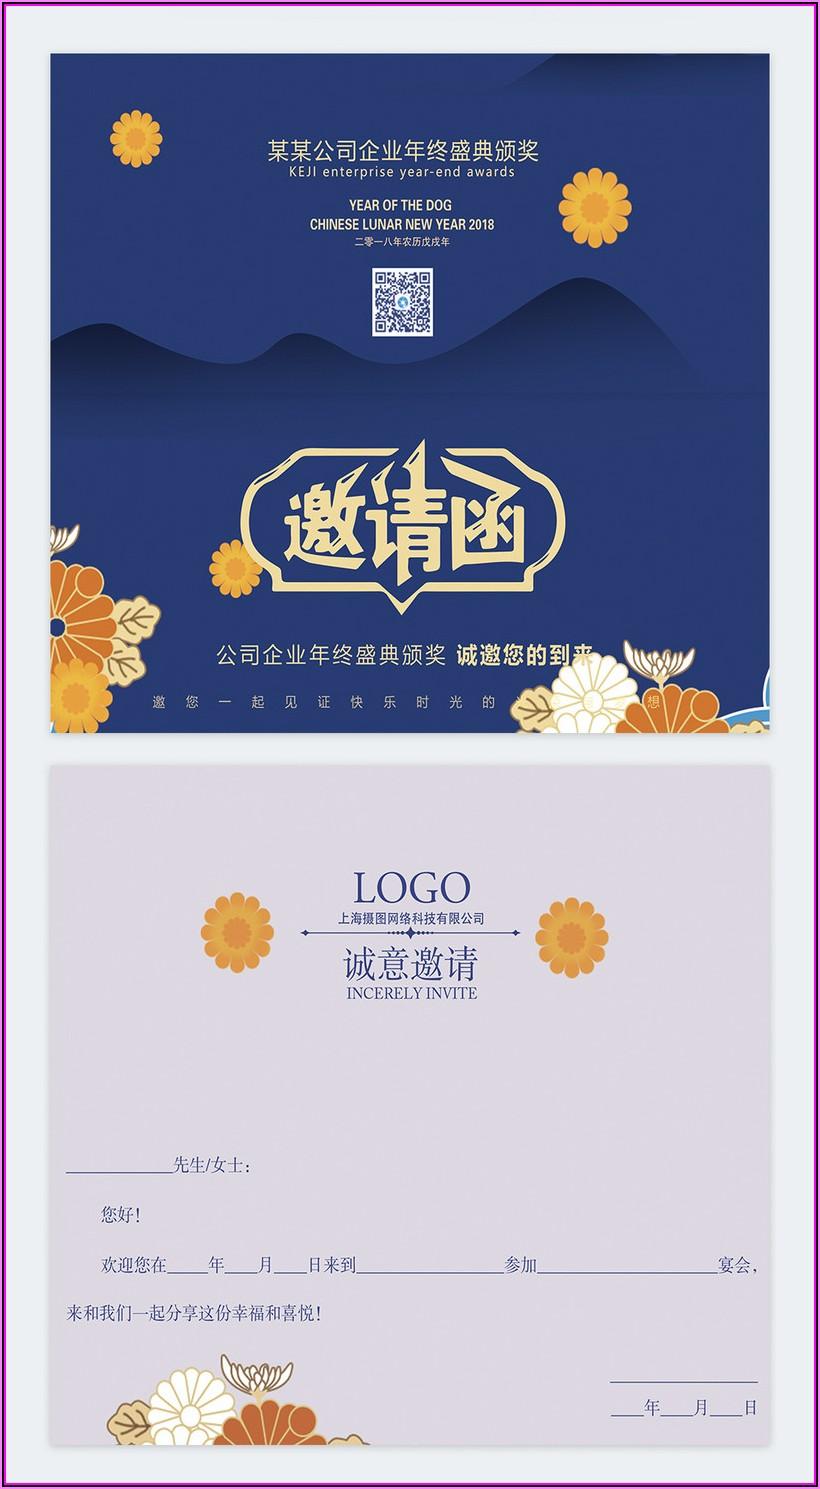 Award Ceremony Invitation Template Free Download